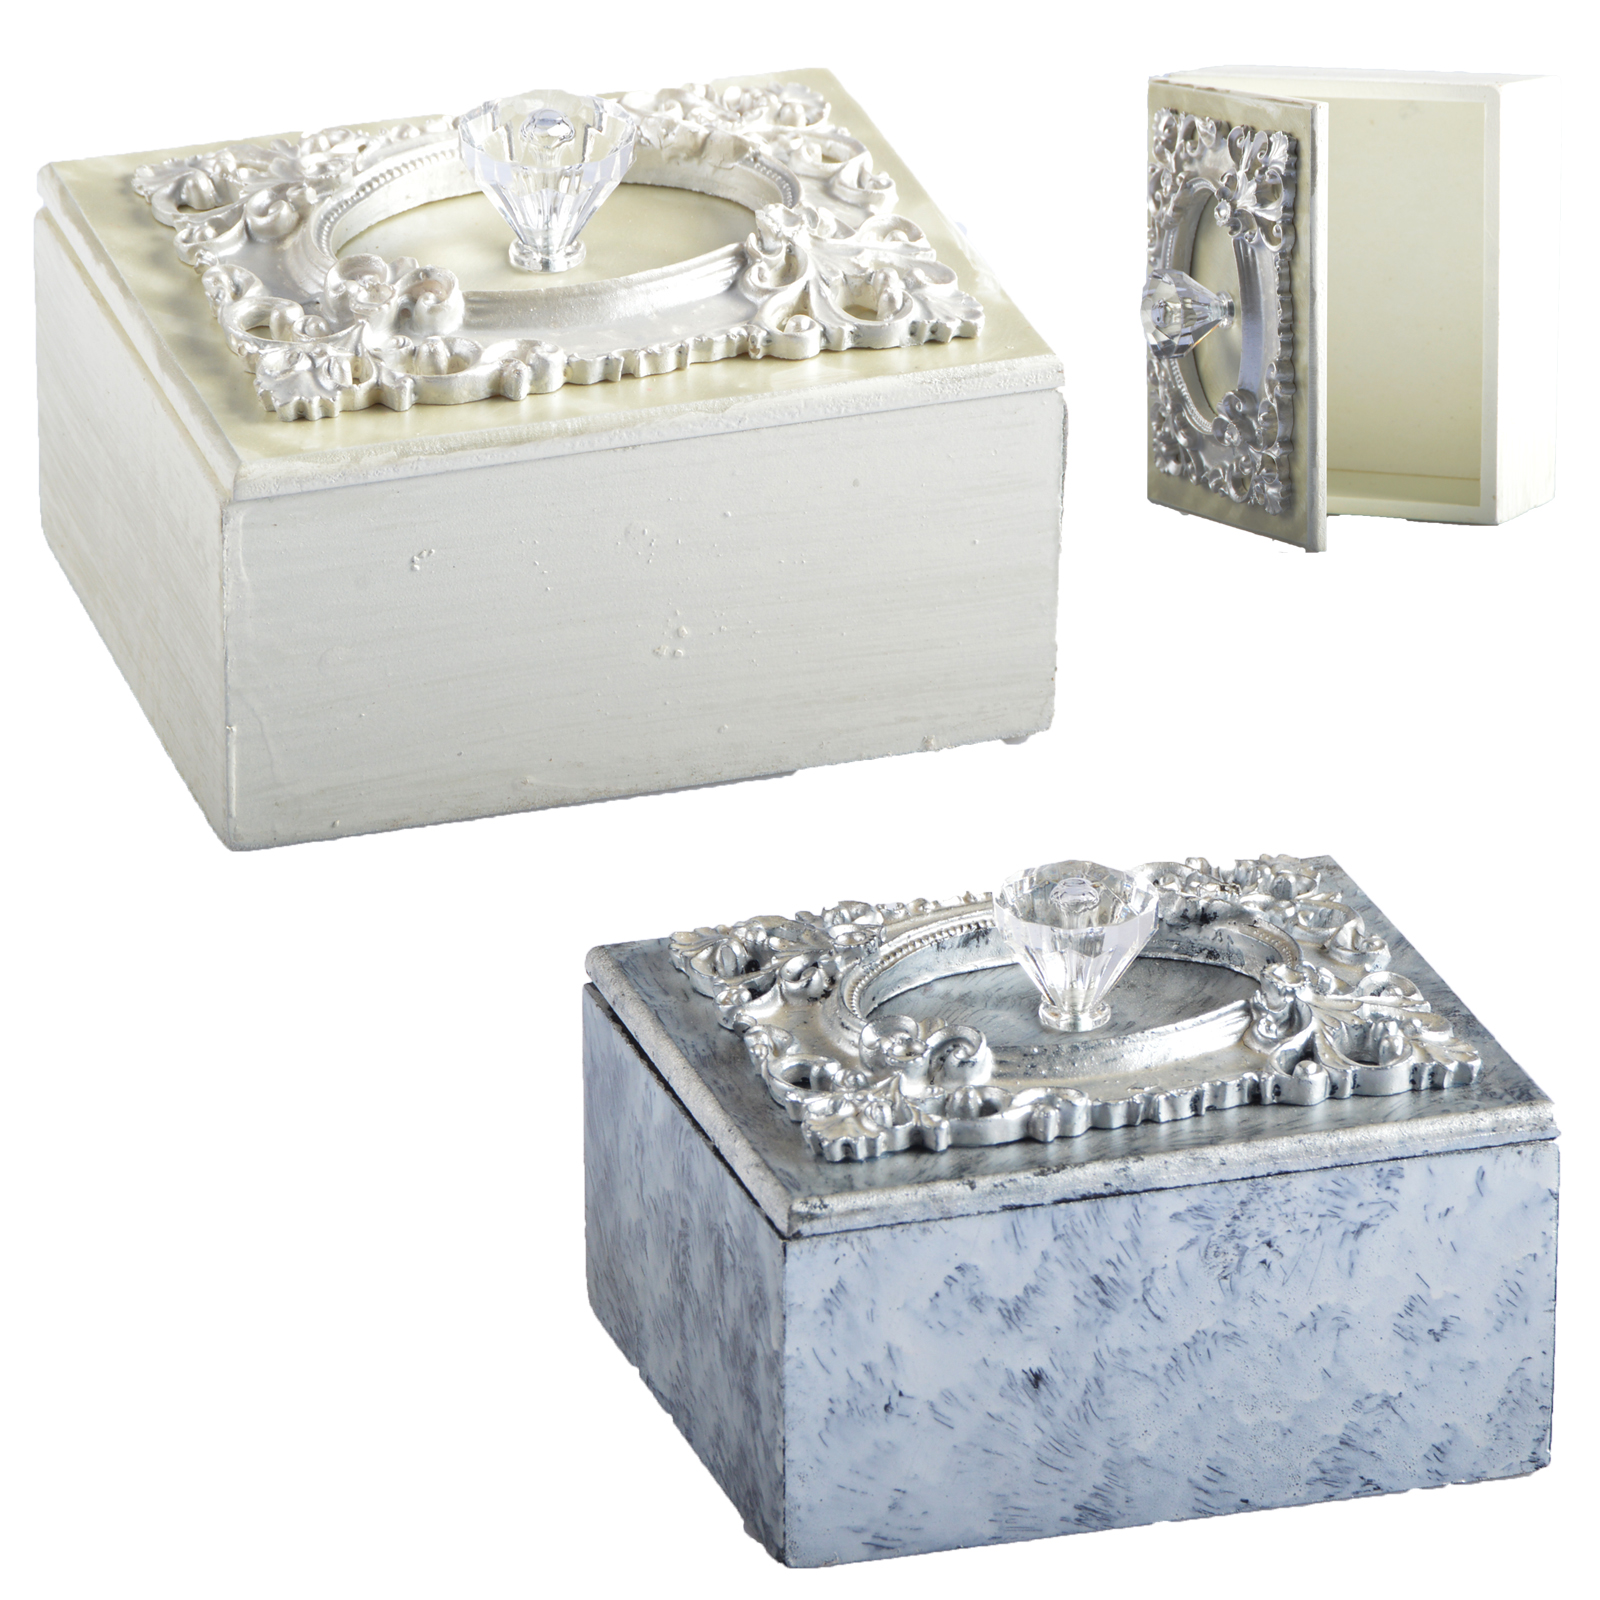 2 farben schmuckkasten schmuckbeh lter schmuckschatulle. Black Bedroom Furniture Sets. Home Design Ideas